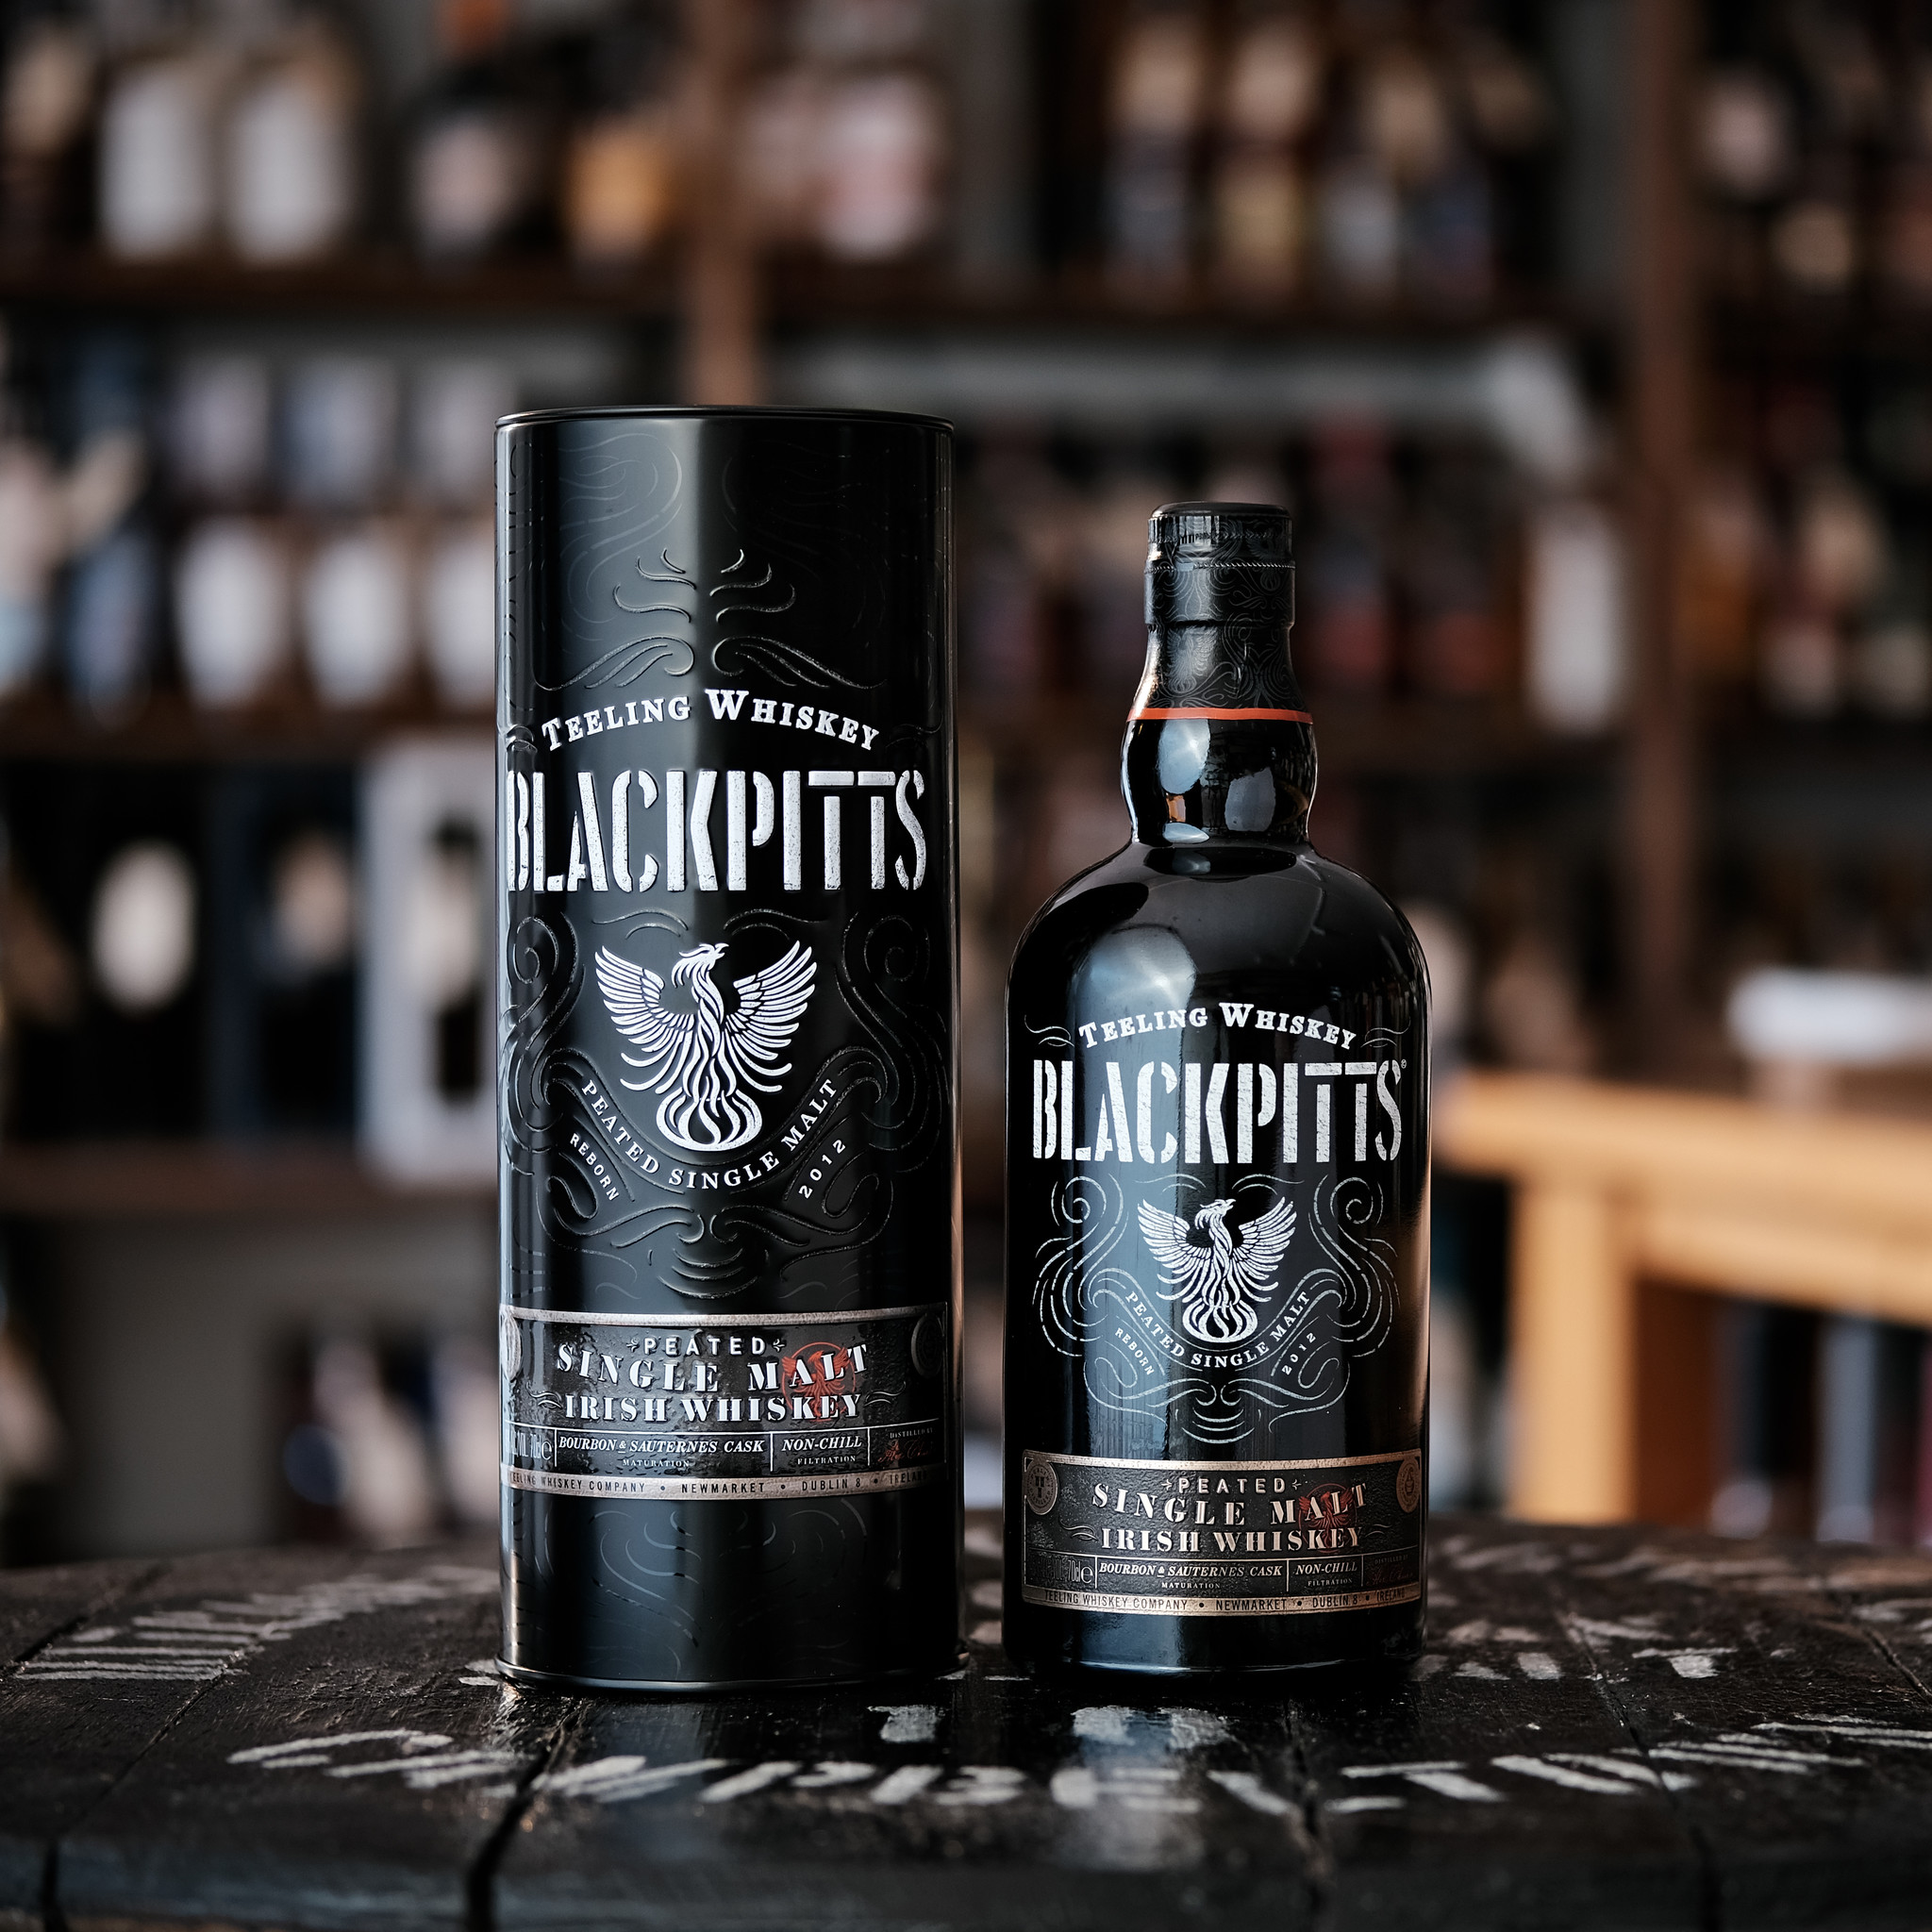 Blackpitts